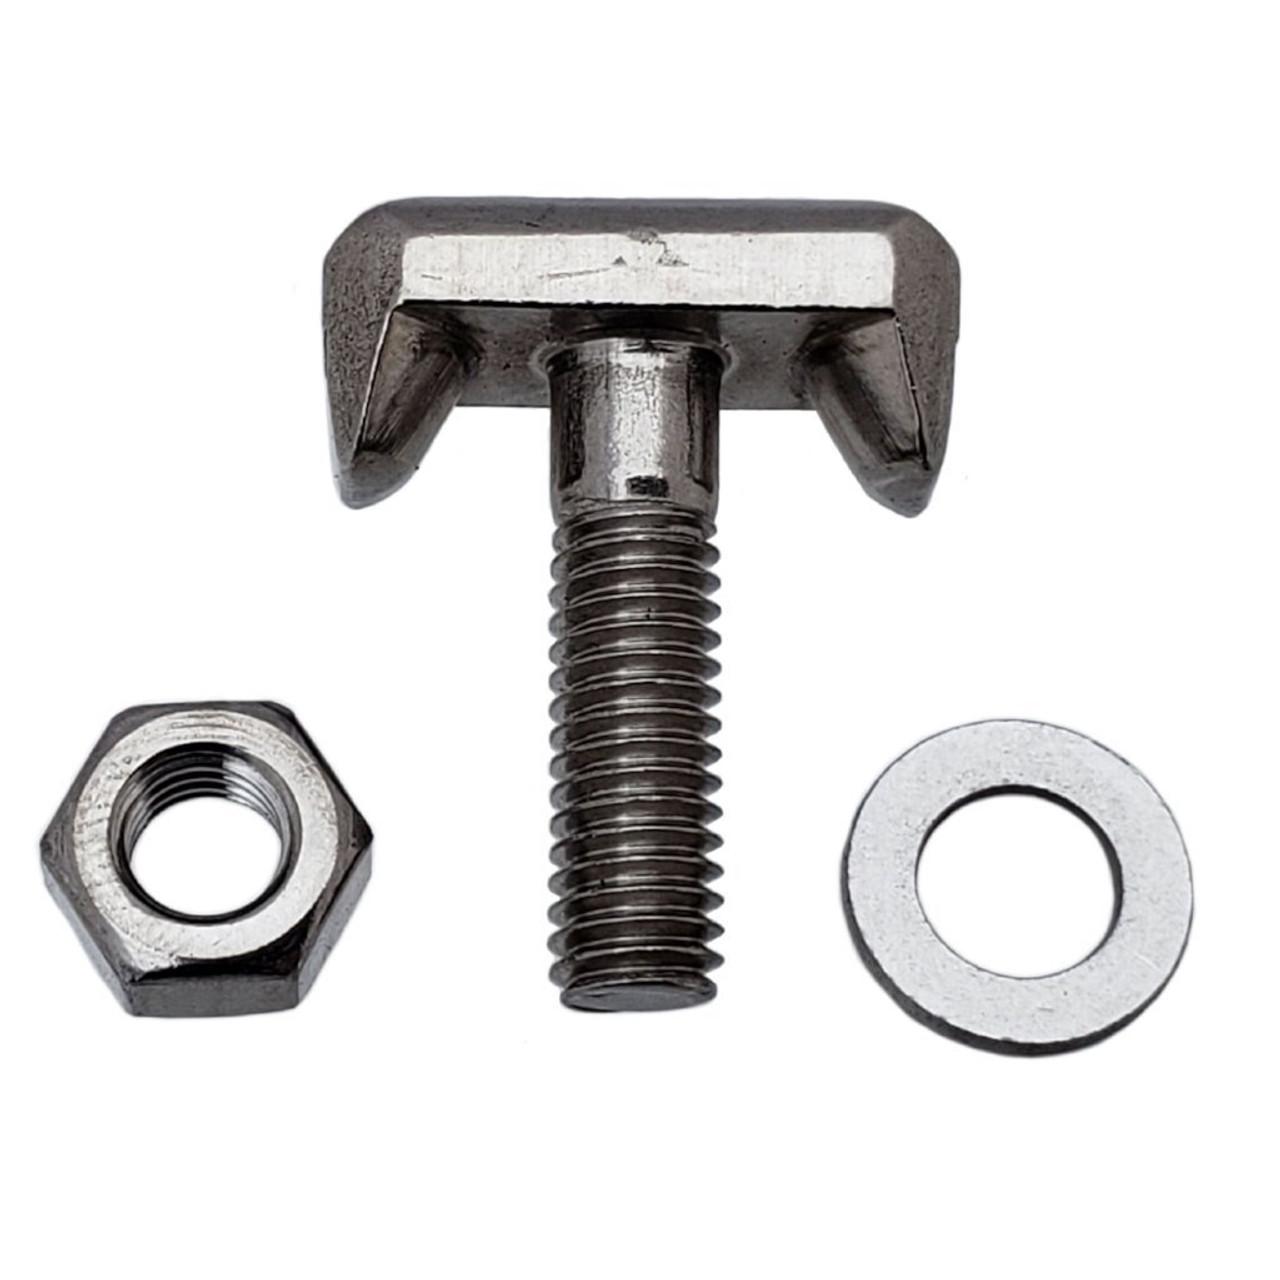 Battery Terminal T-Bolt stainless steel, Interchanges: Dorman 64740 GM 19116852, Audi VW 6X0-915-138, BMW 61128373946